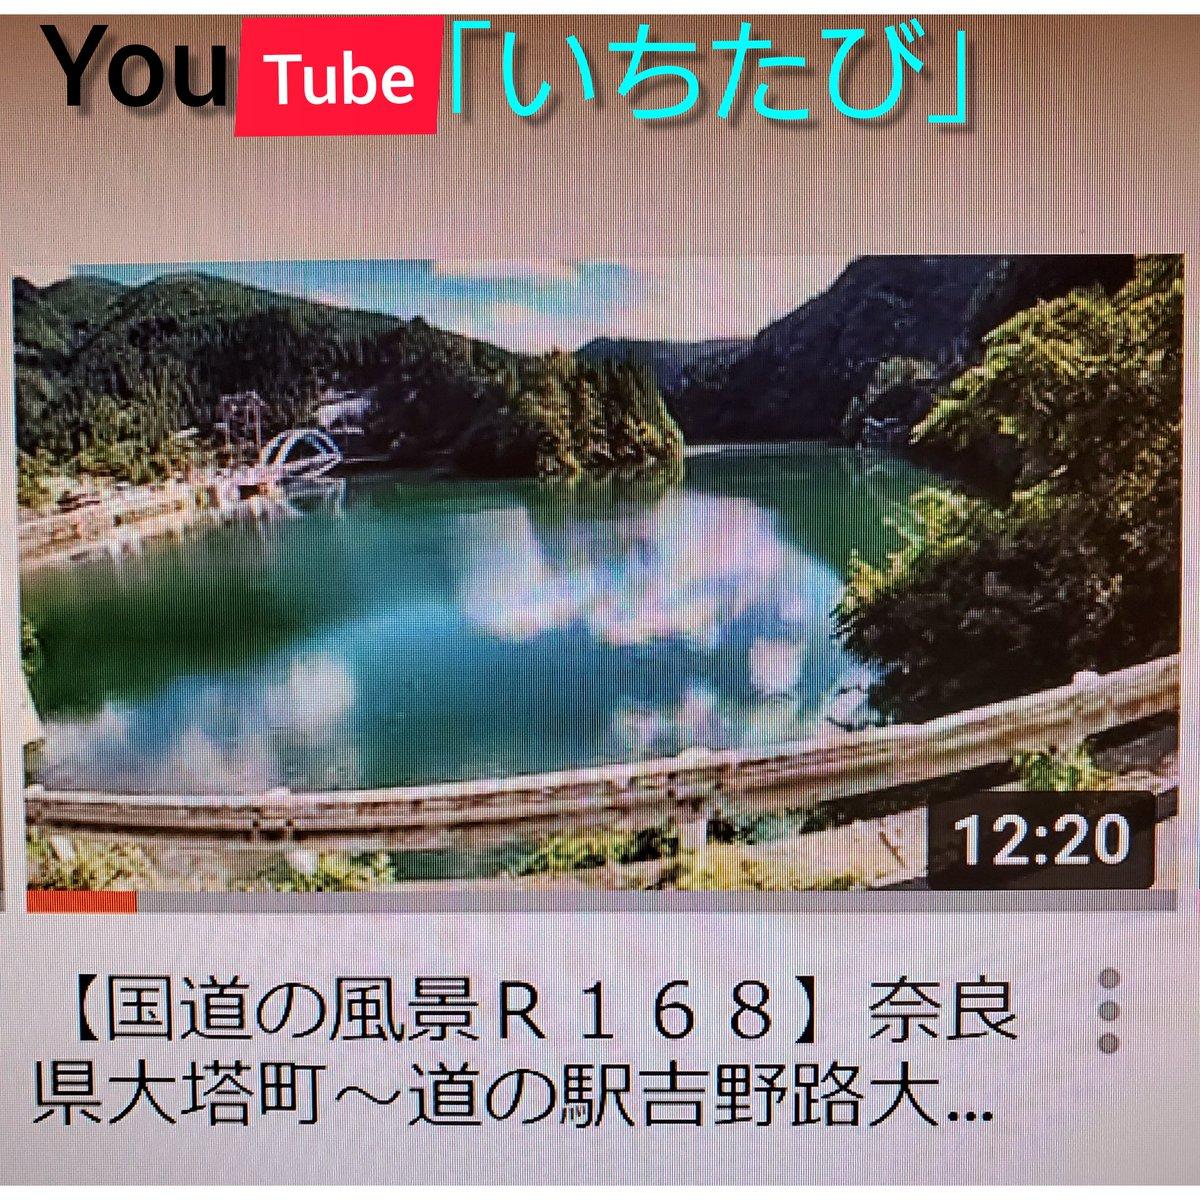 https://t.co/74JWySlX2q #山岳風景 #山岳車窓 #奈良県 #五條市 #夏山風景 https://t.co/vJxYiwx6Dy